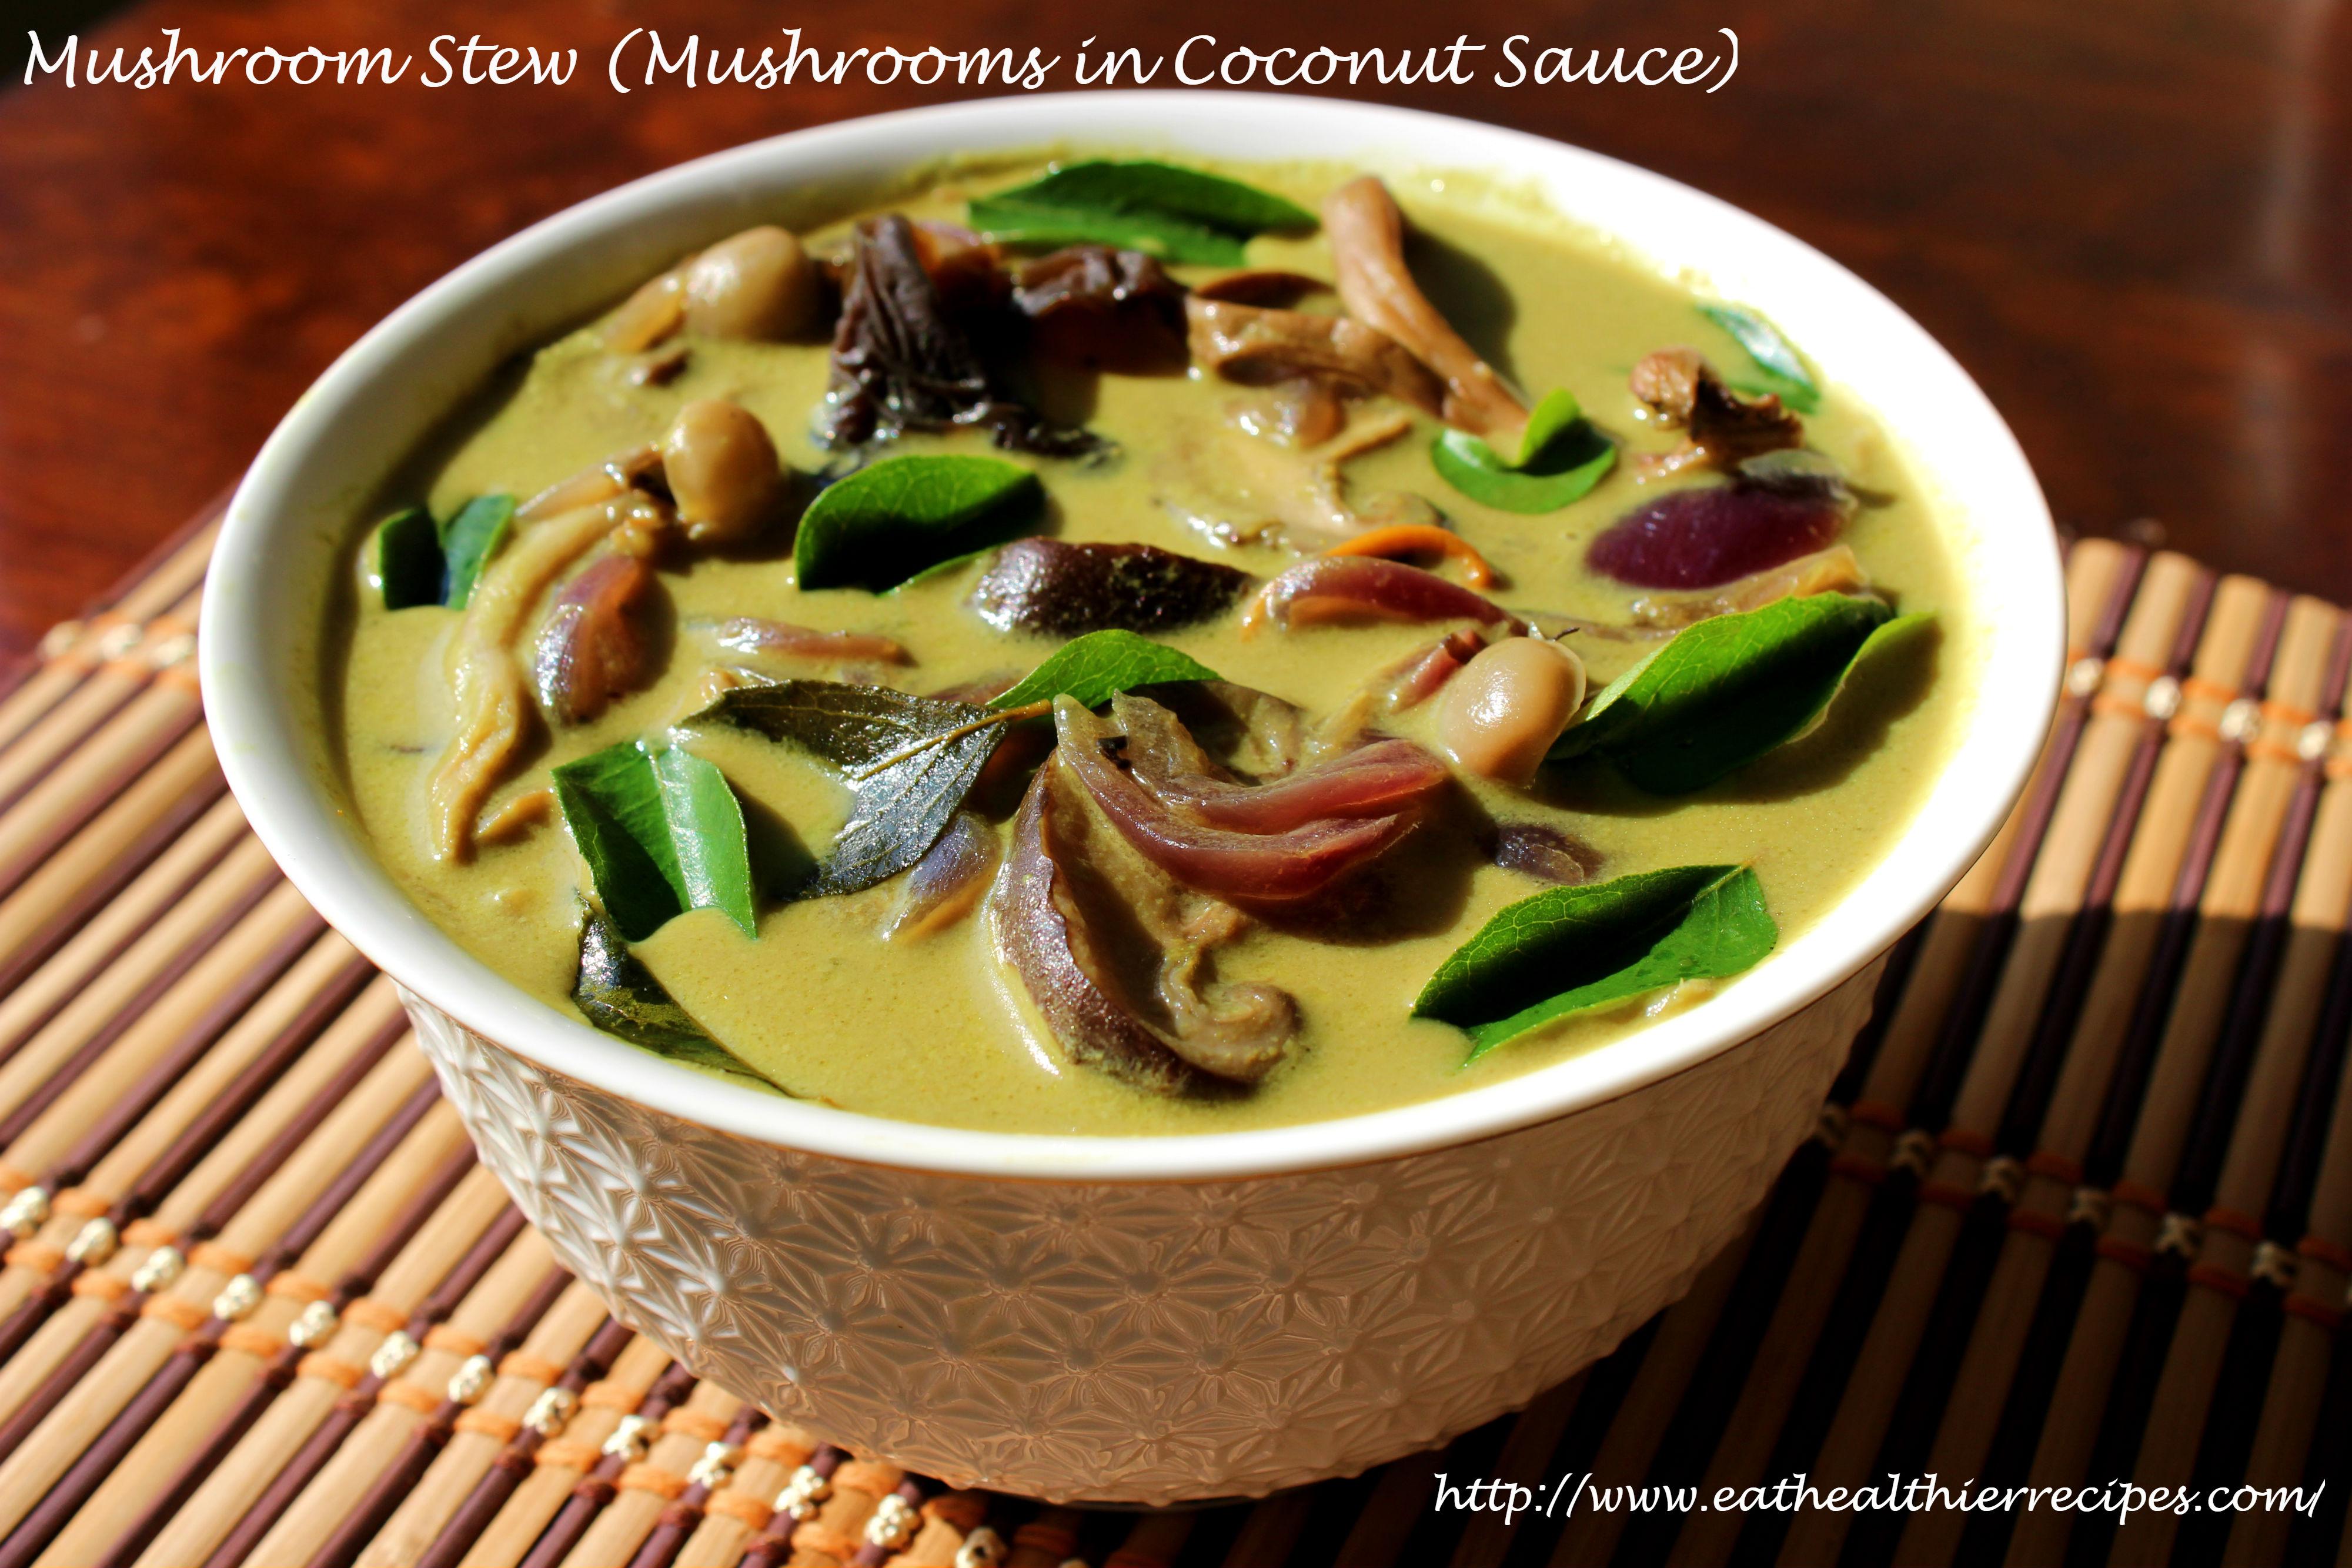 Mushroom Stew (Mushrooms in Coconut Sauce)